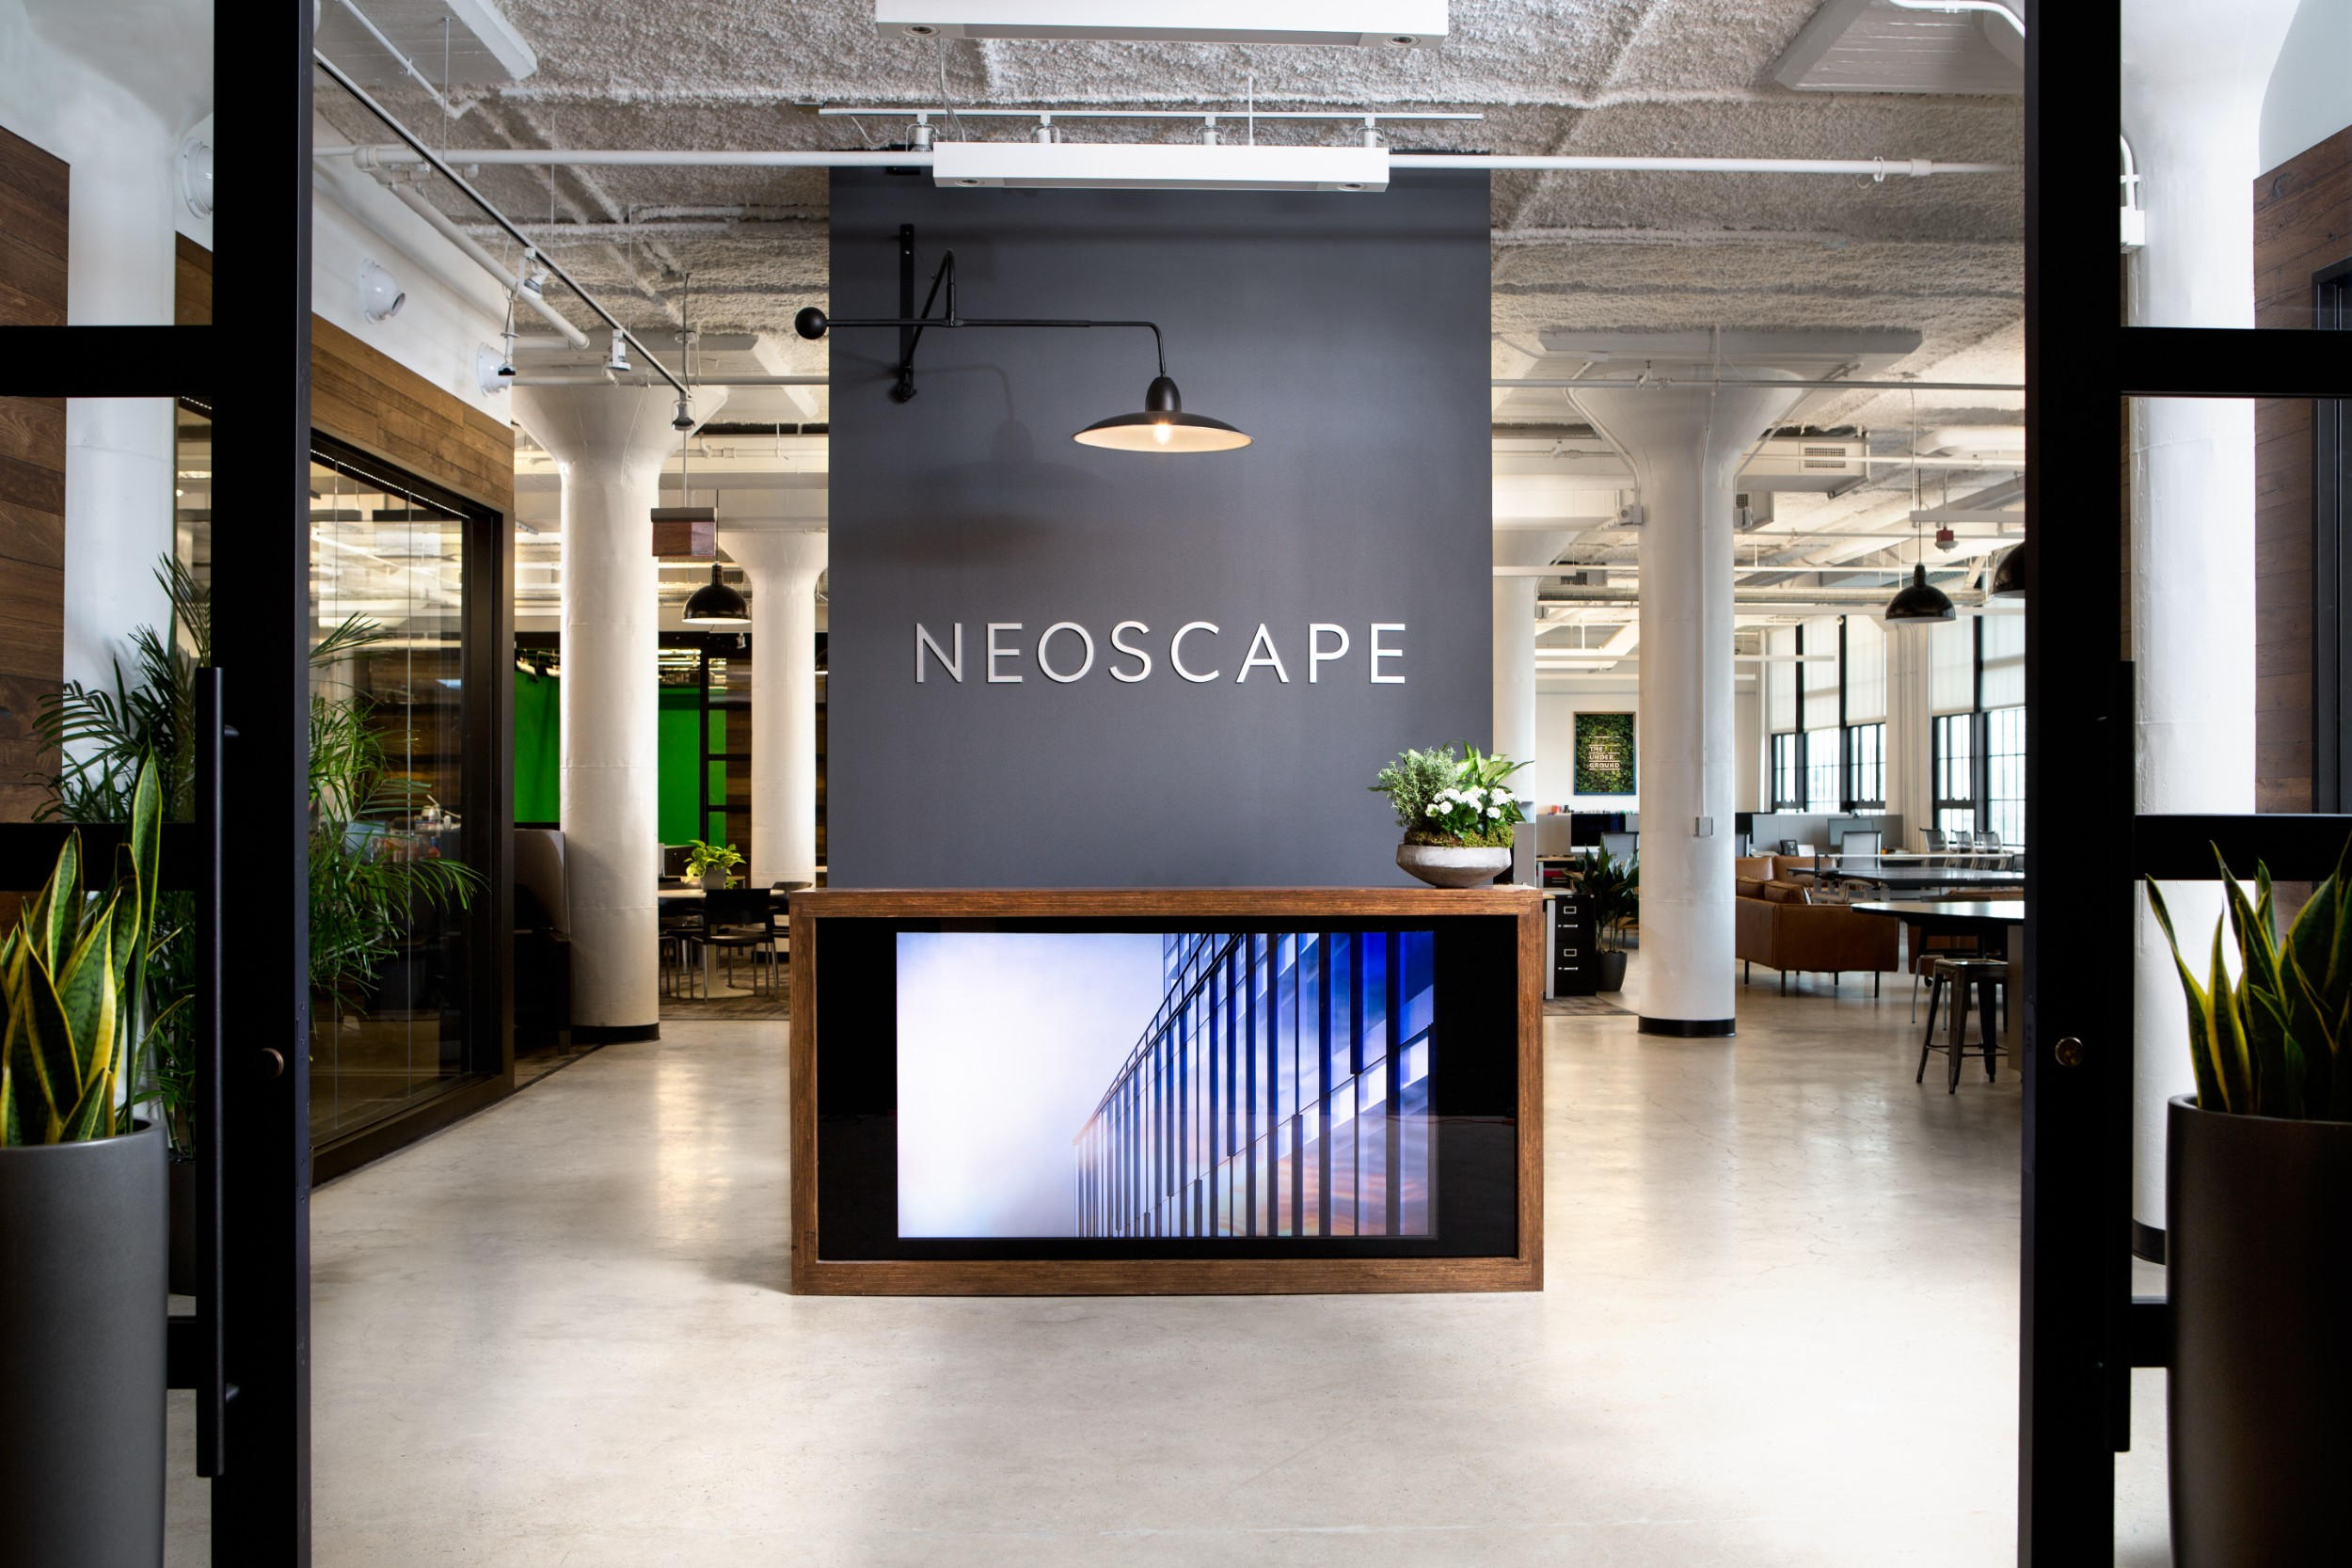 Corderman_Construction_Neoscape_Boston_Drydock_Office_Design_Reception.jpg